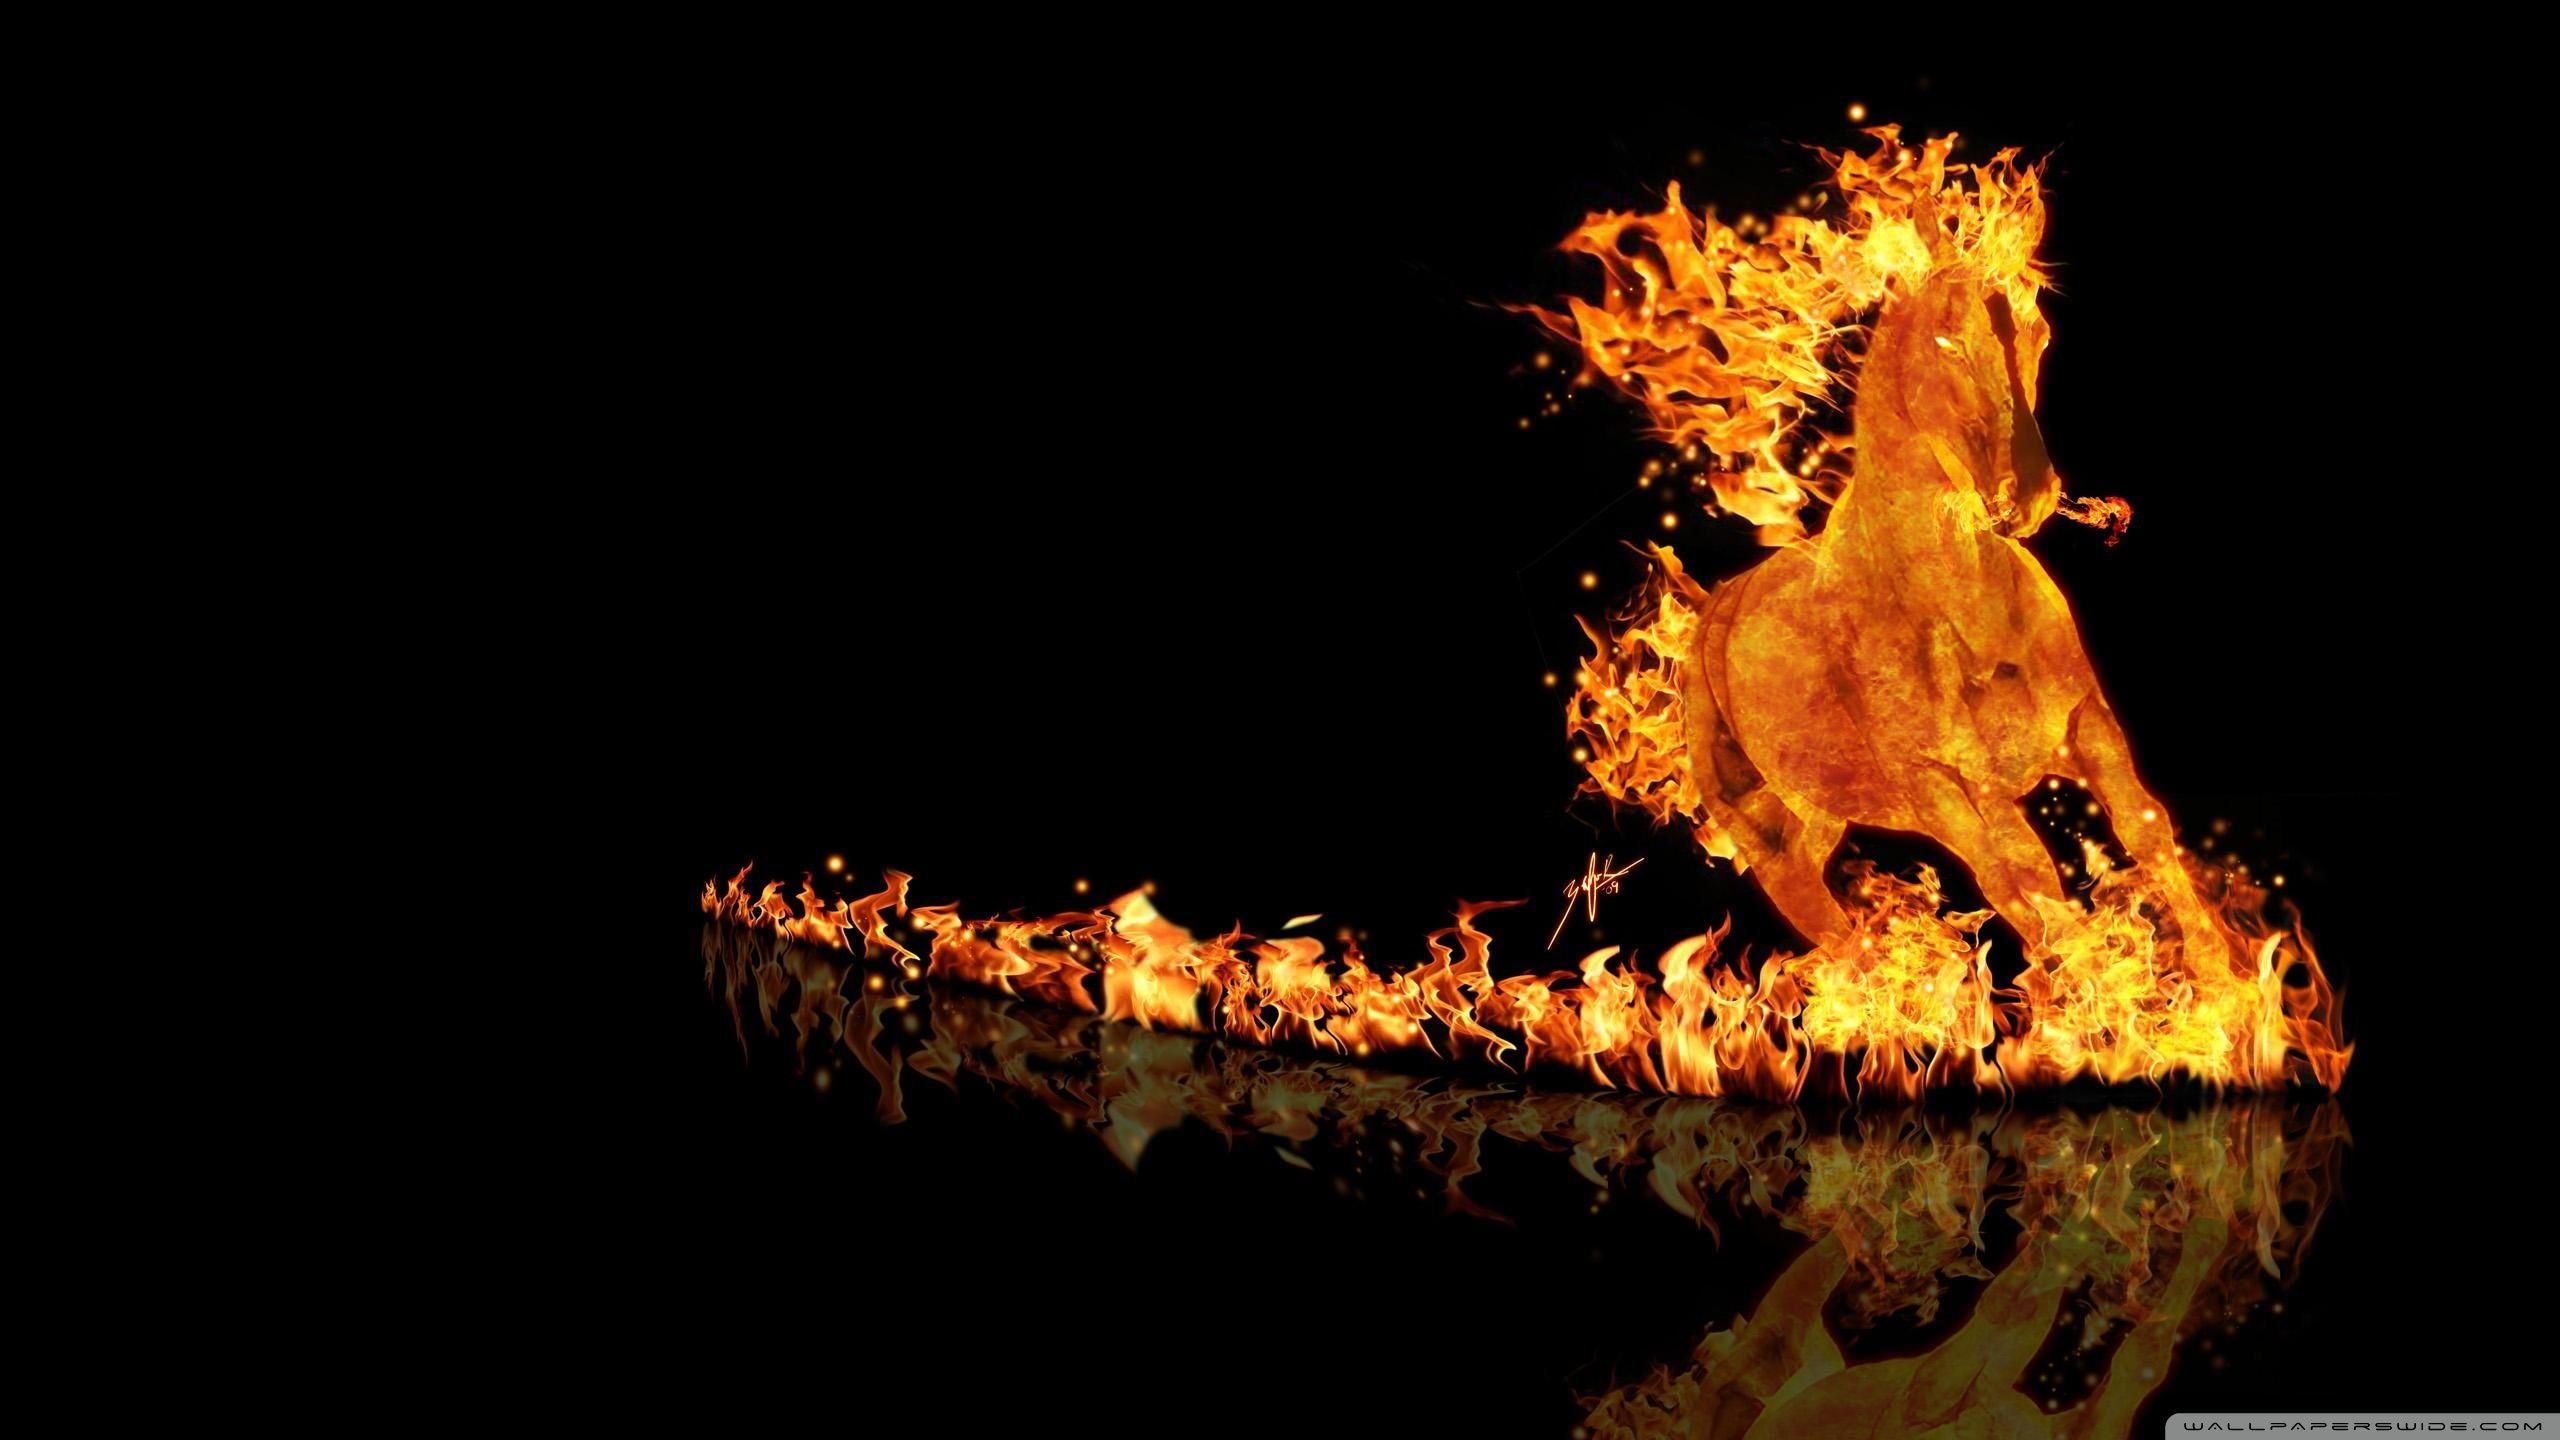 Fantastic Wallpaper High Resolution Fire - b5da23839e0c1e43c001efeda8056cb8  Image_95563.jpg